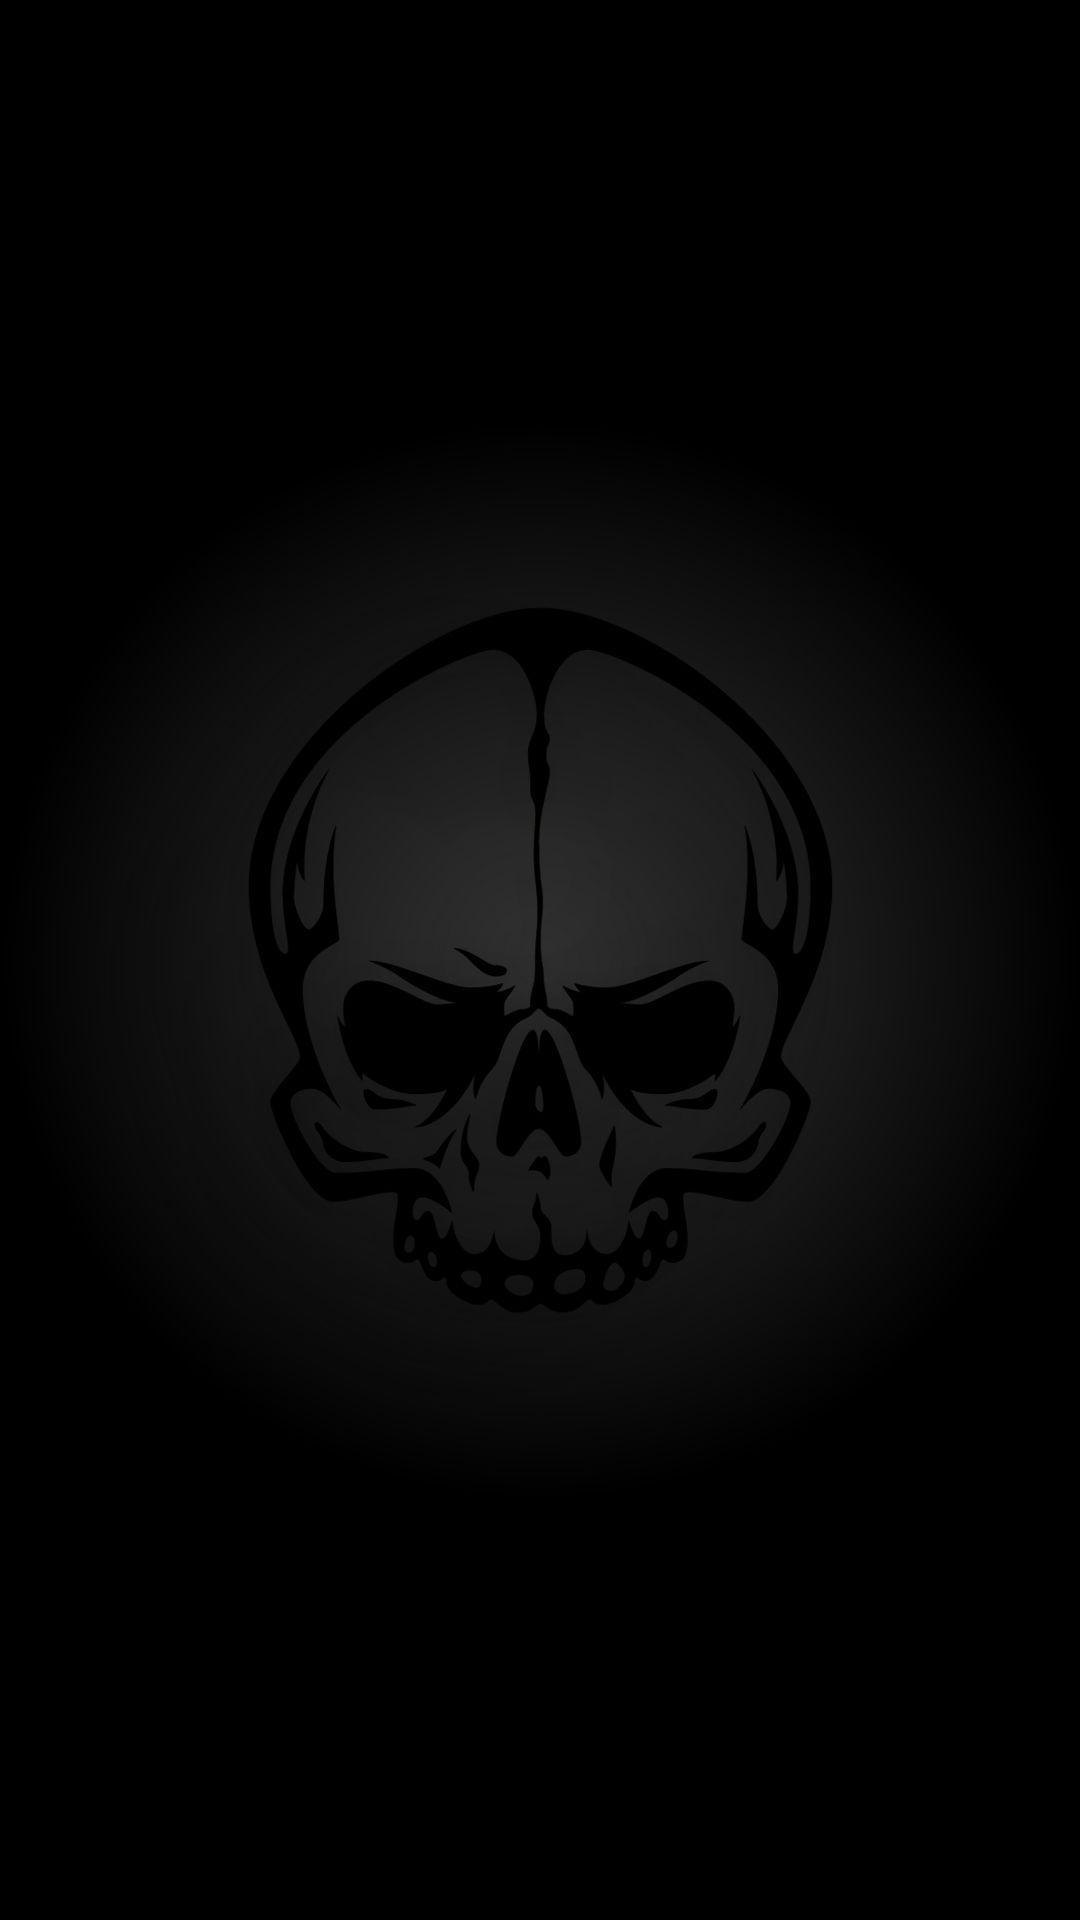 1080x1920 Skull Wallpapers Wallpaper Cave